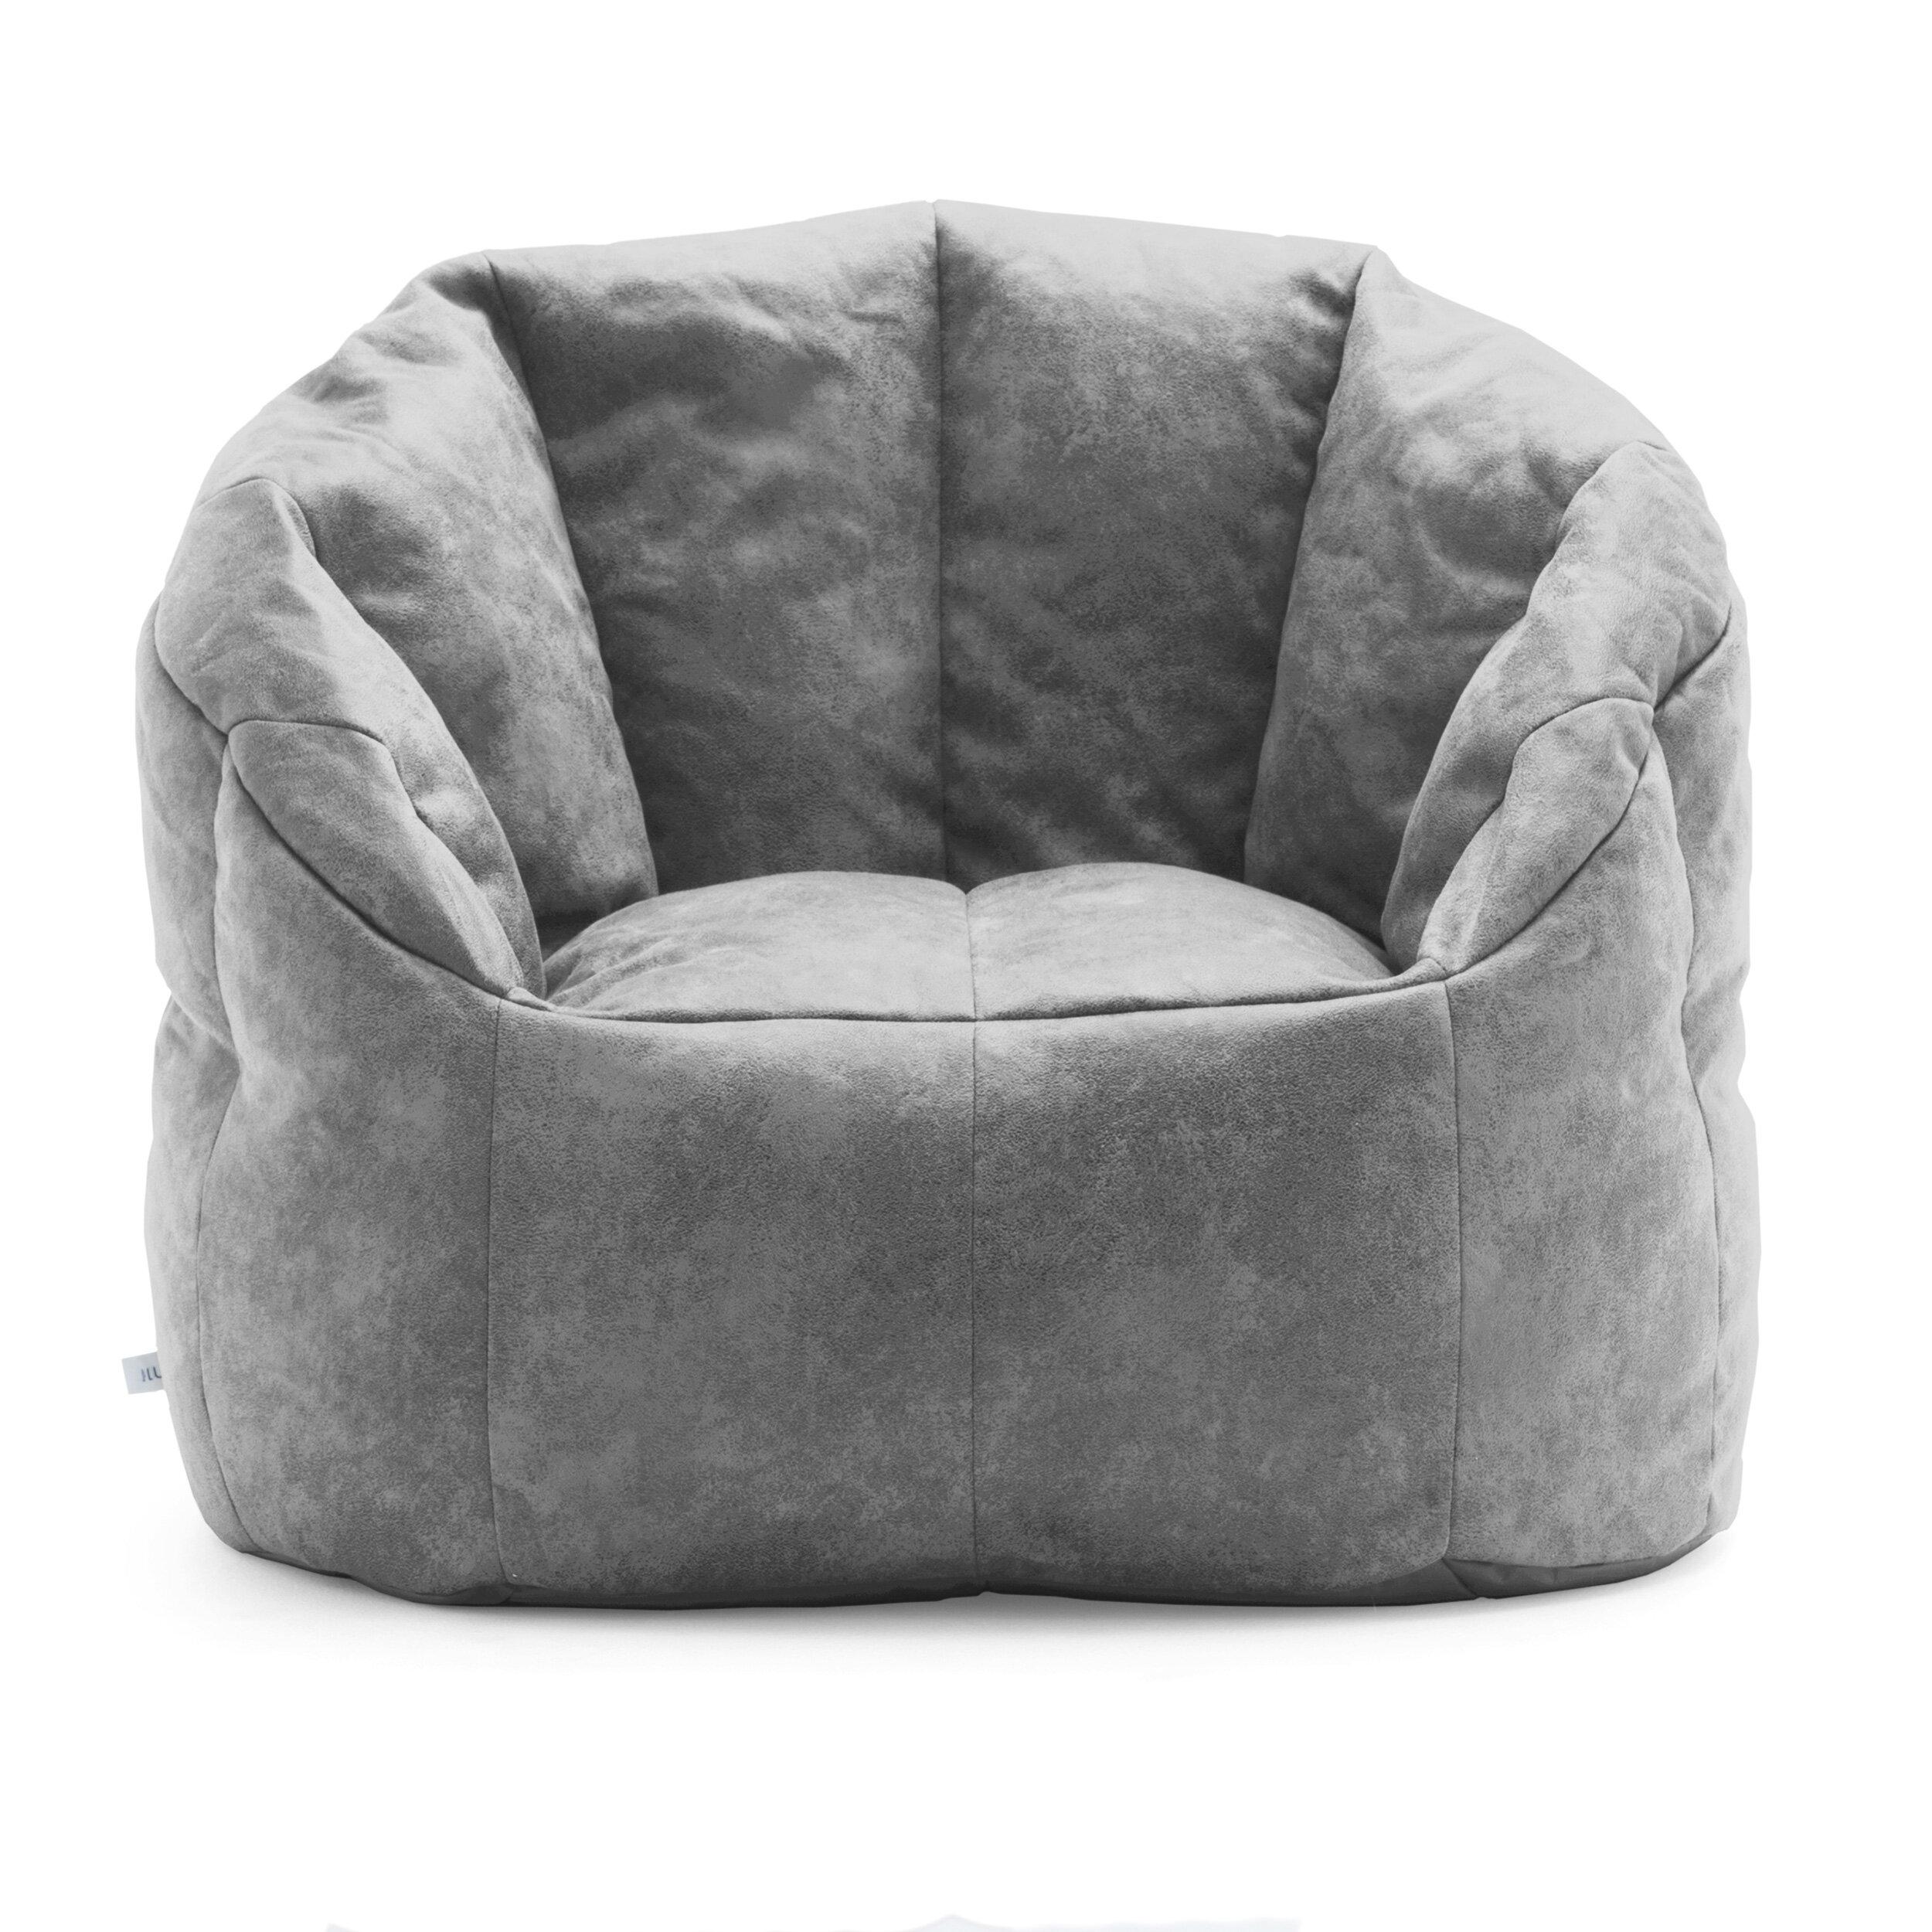 Comfort Research Big Joe Lux Standard Bean Bag Chair Reviews Wayfair